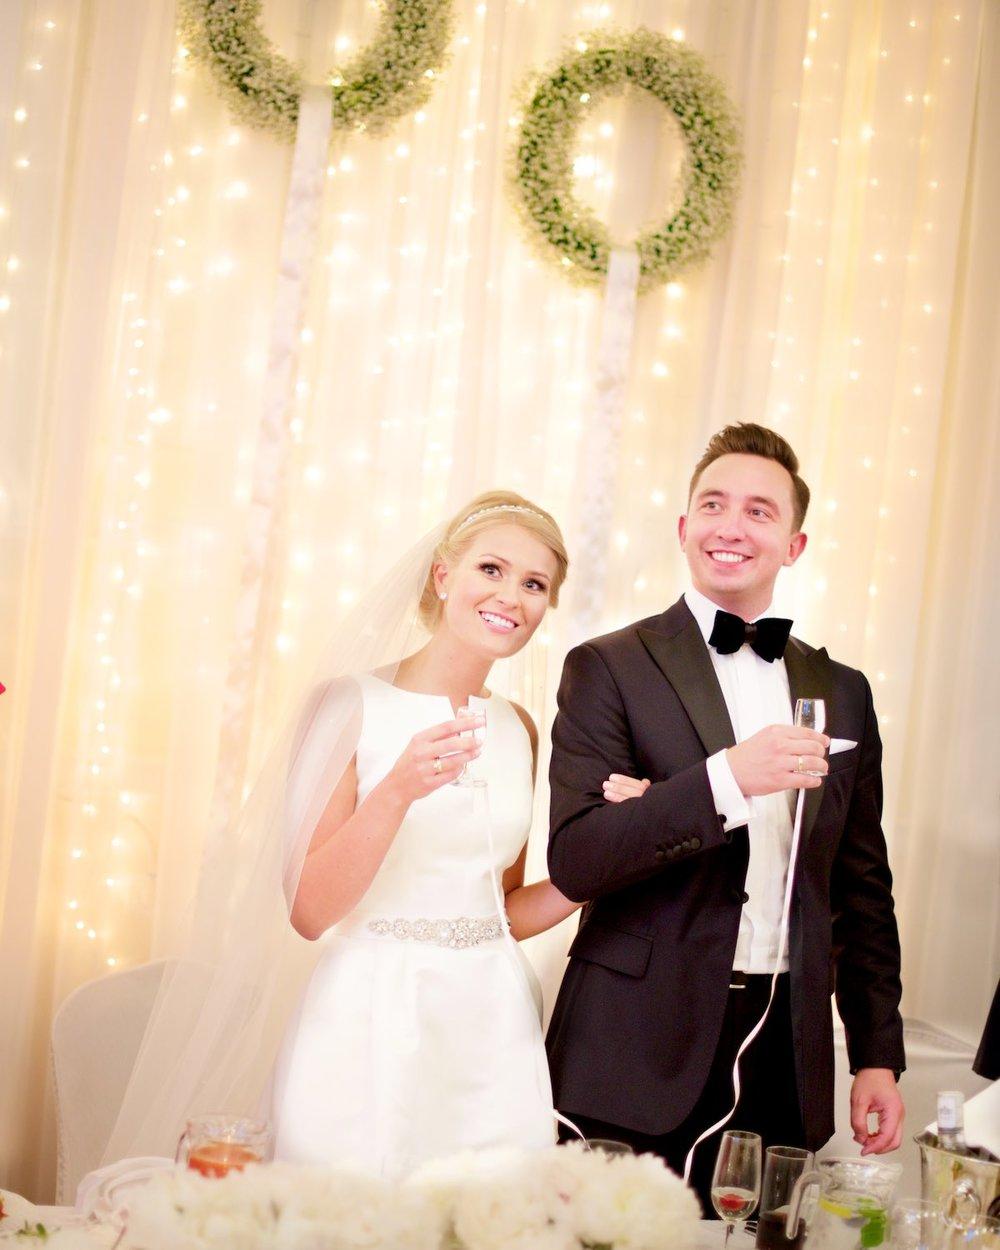 polish-wedding-michal-pfeil-25.jpg